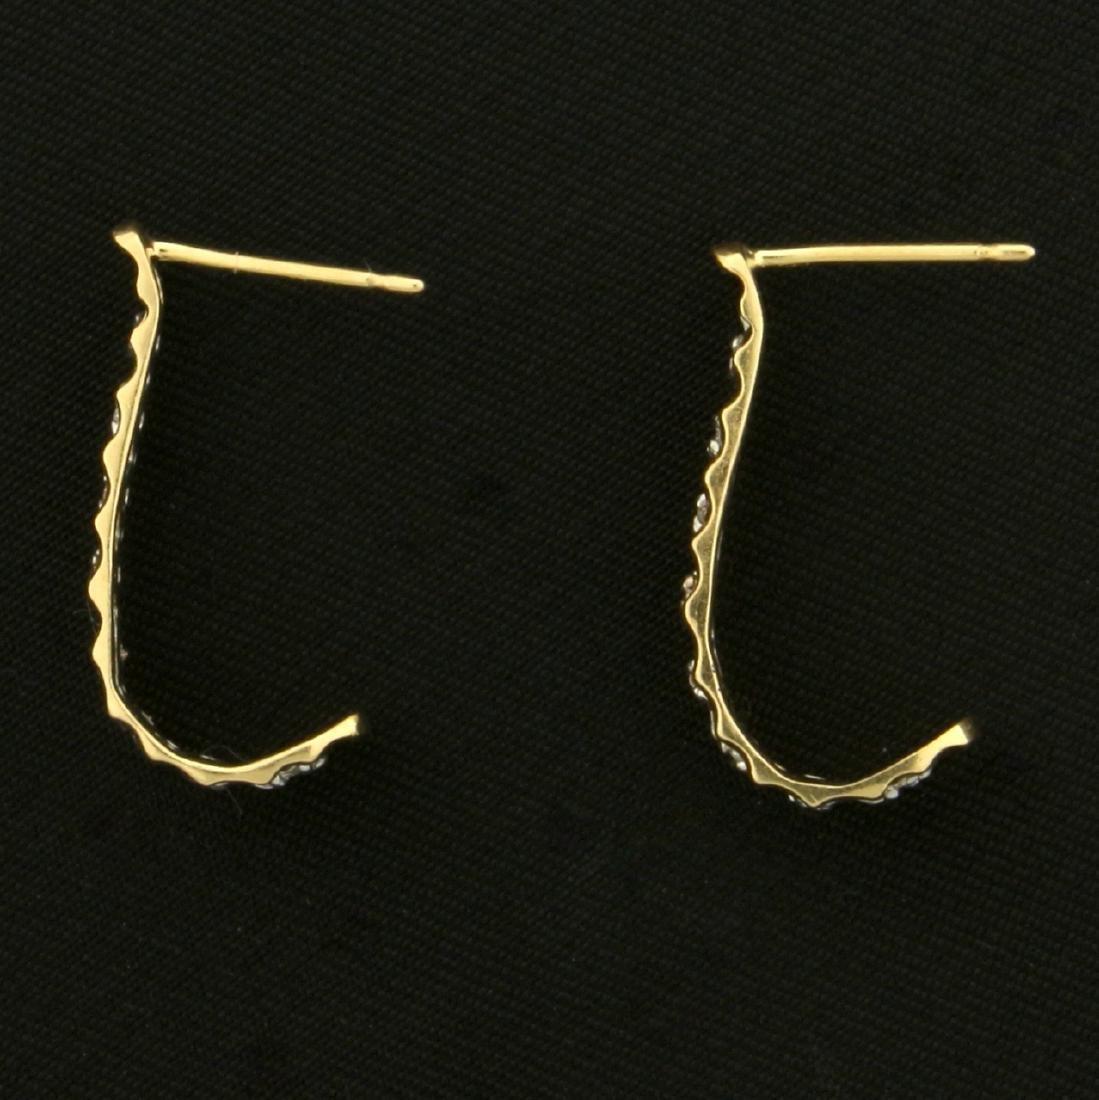 J Shaped Drop Diamond Earrings in 14K Yellow and White - 2